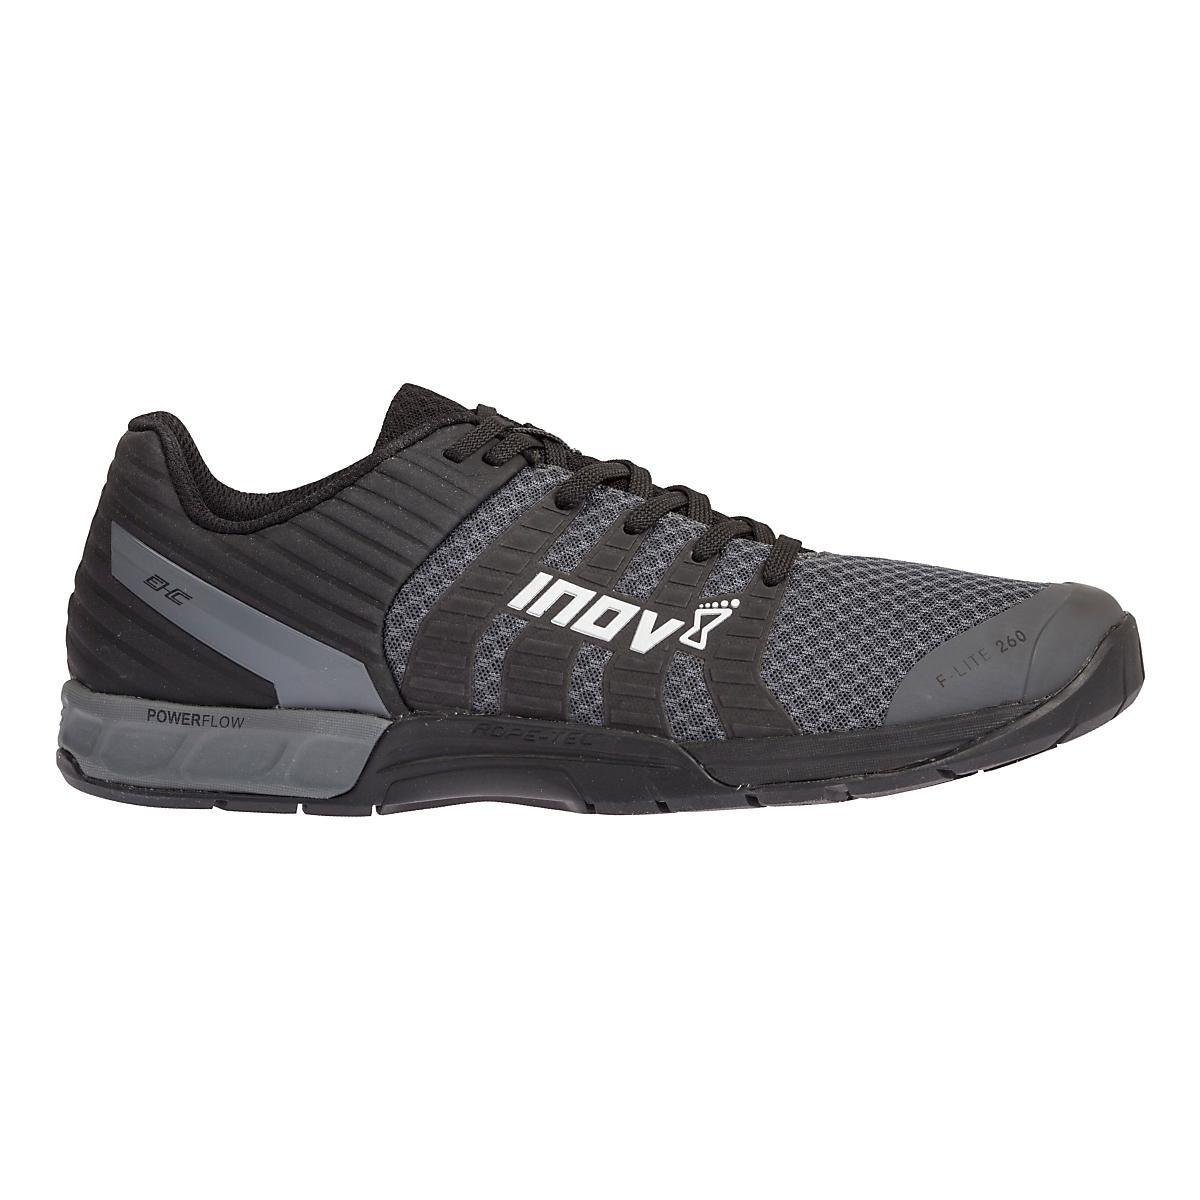 mizuno mens running shoes size 9 years old king white belt